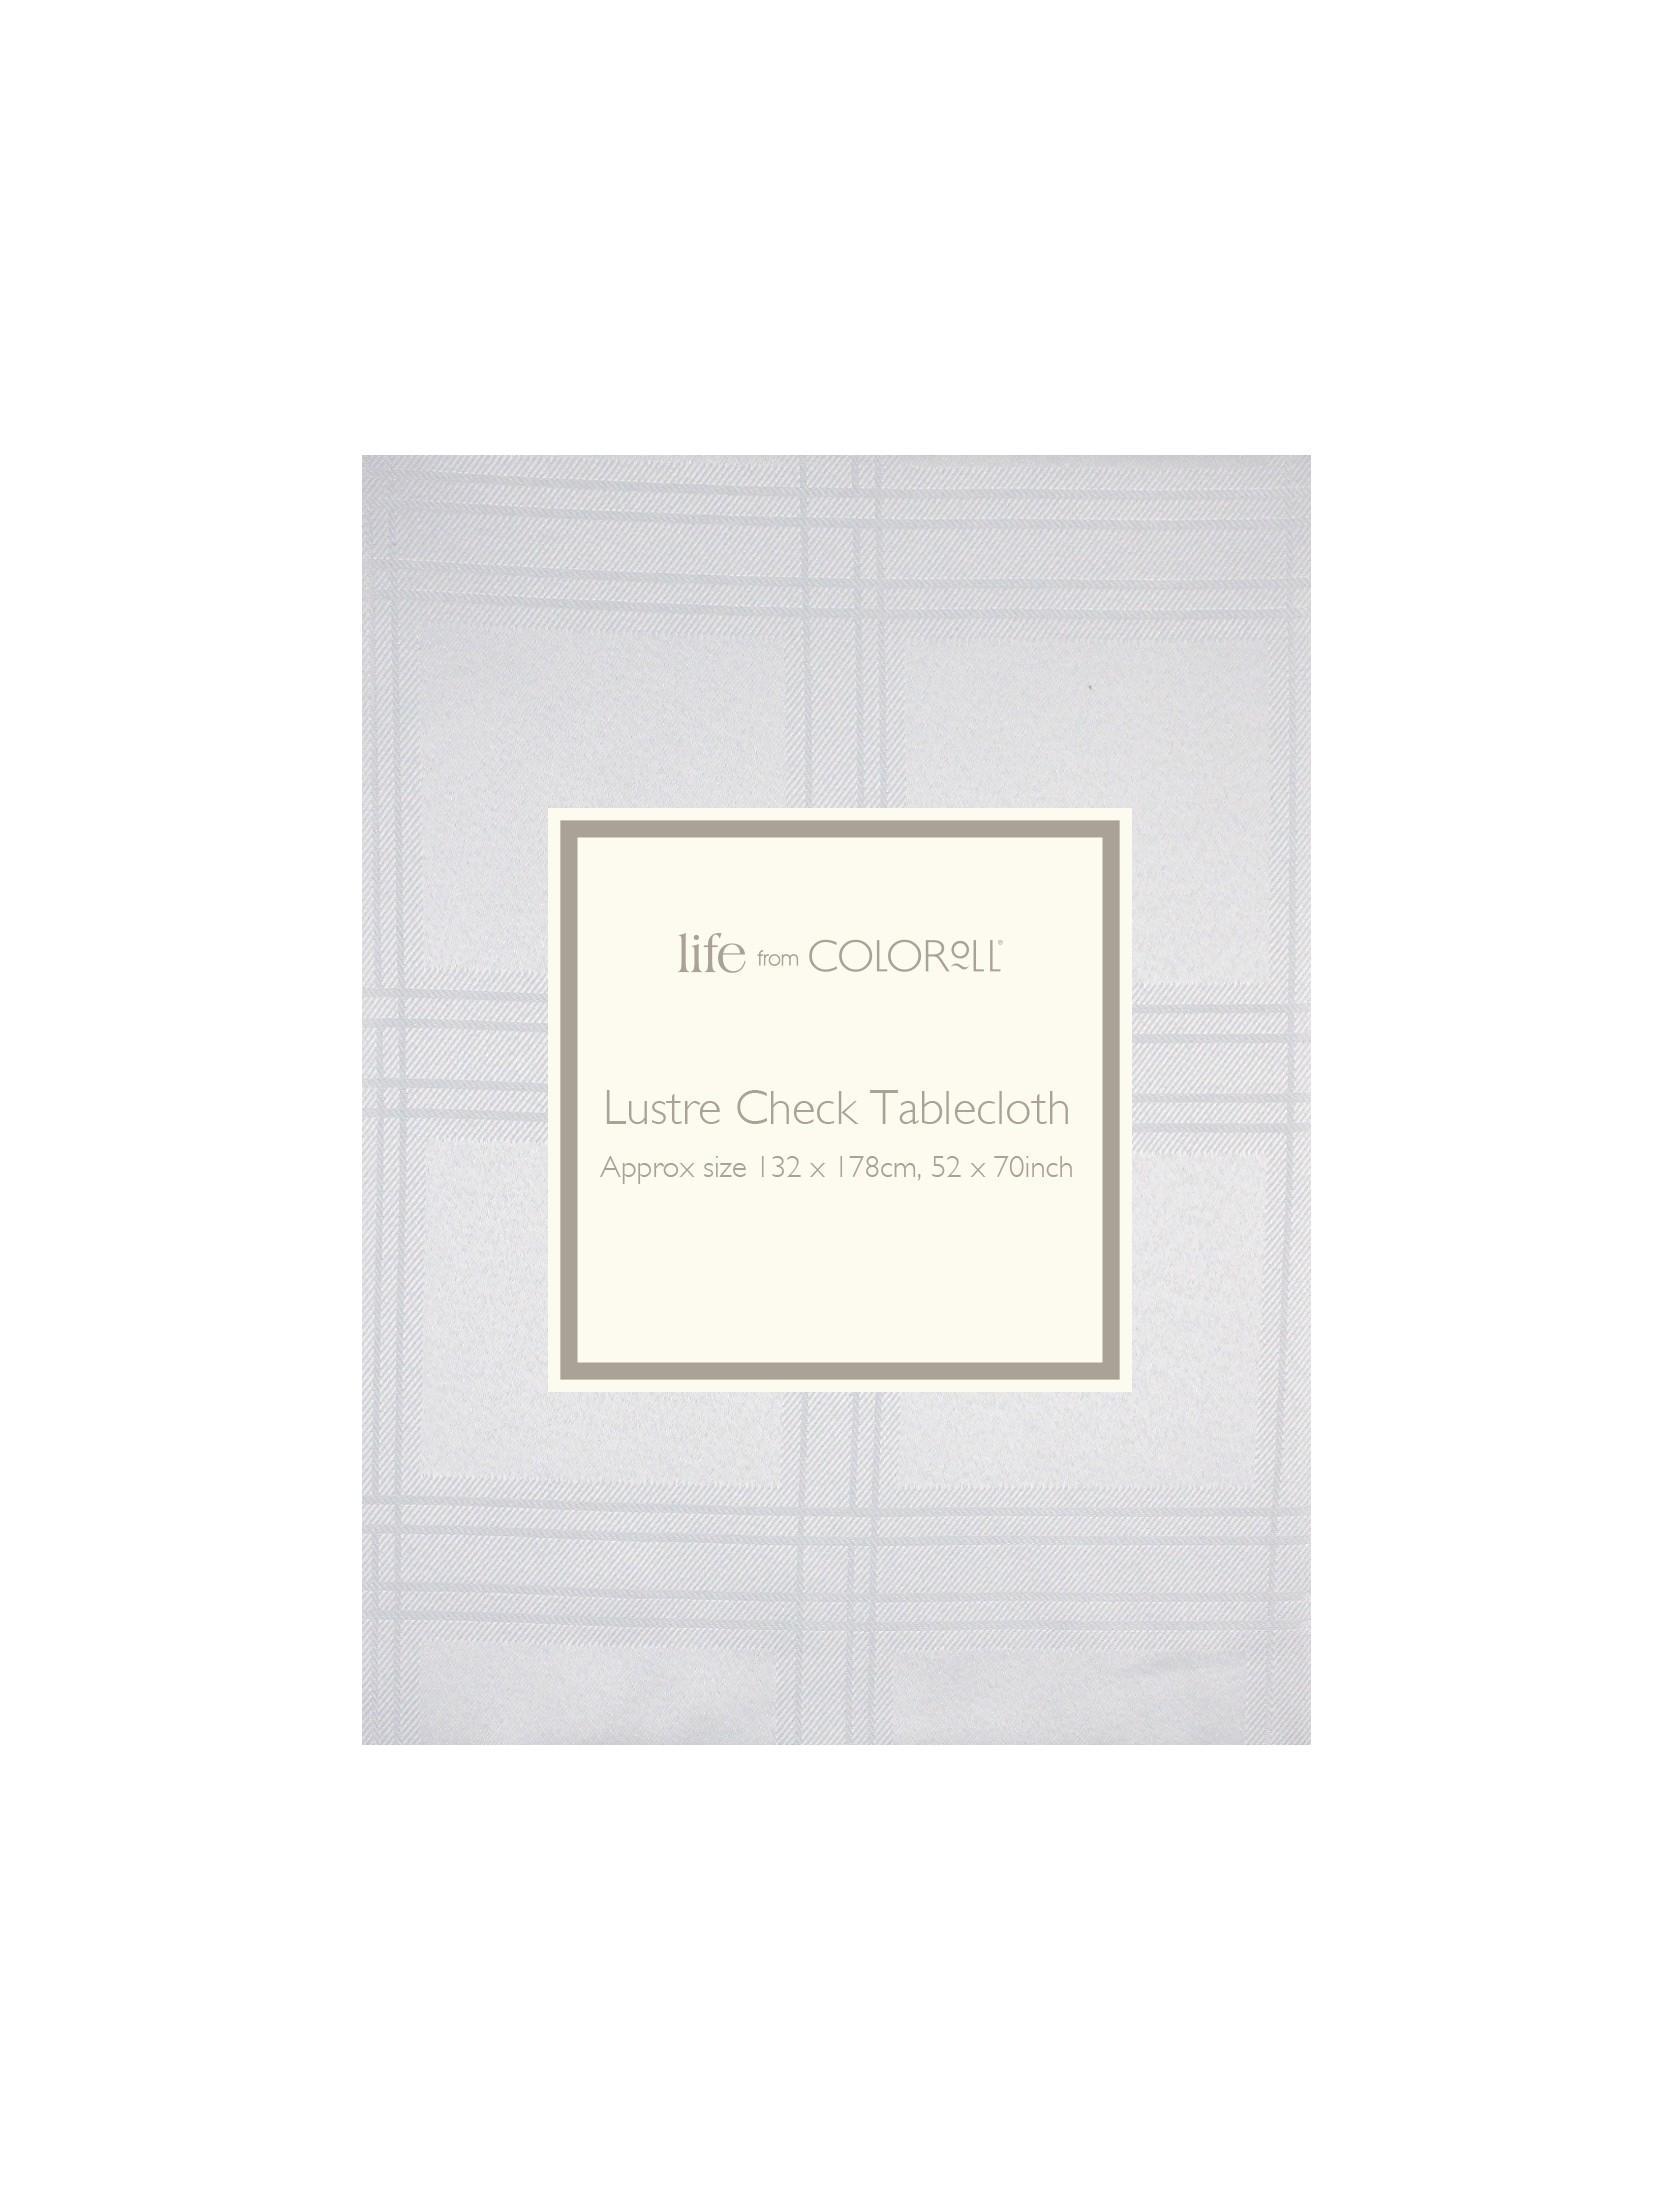 Ponden Home Lustre Check Tablecloth White